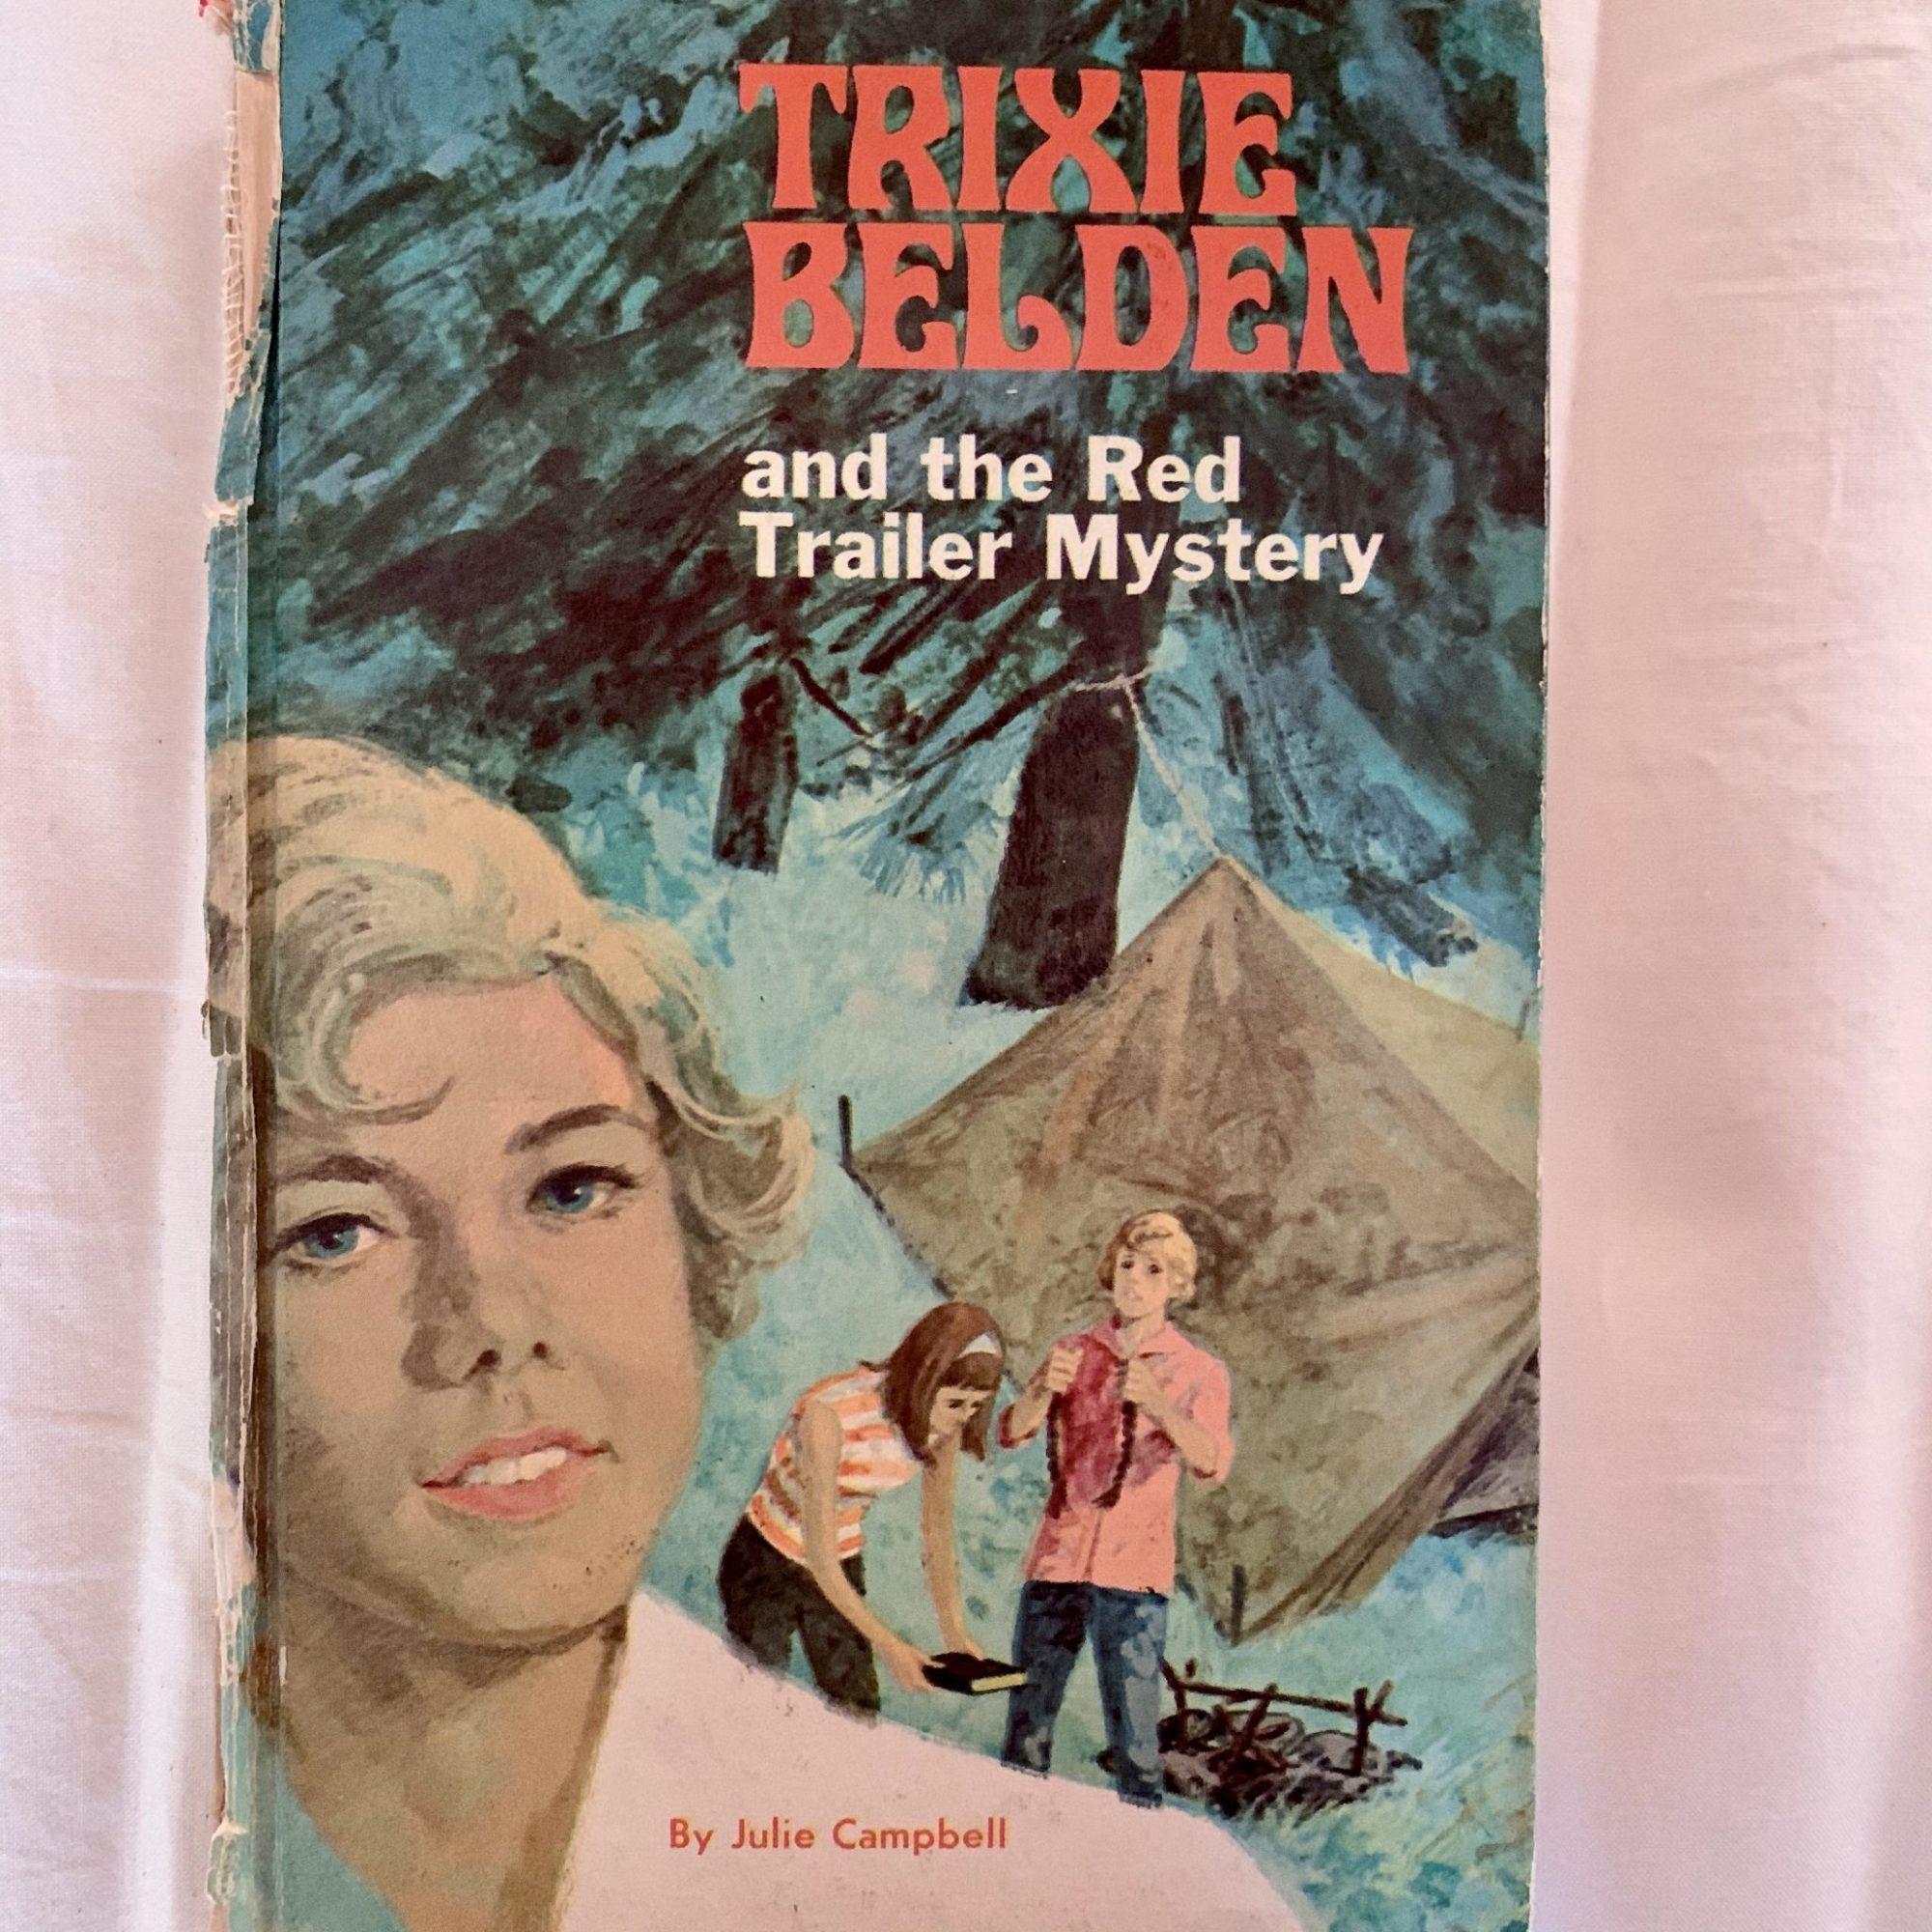 Trixie Belden - favourite book